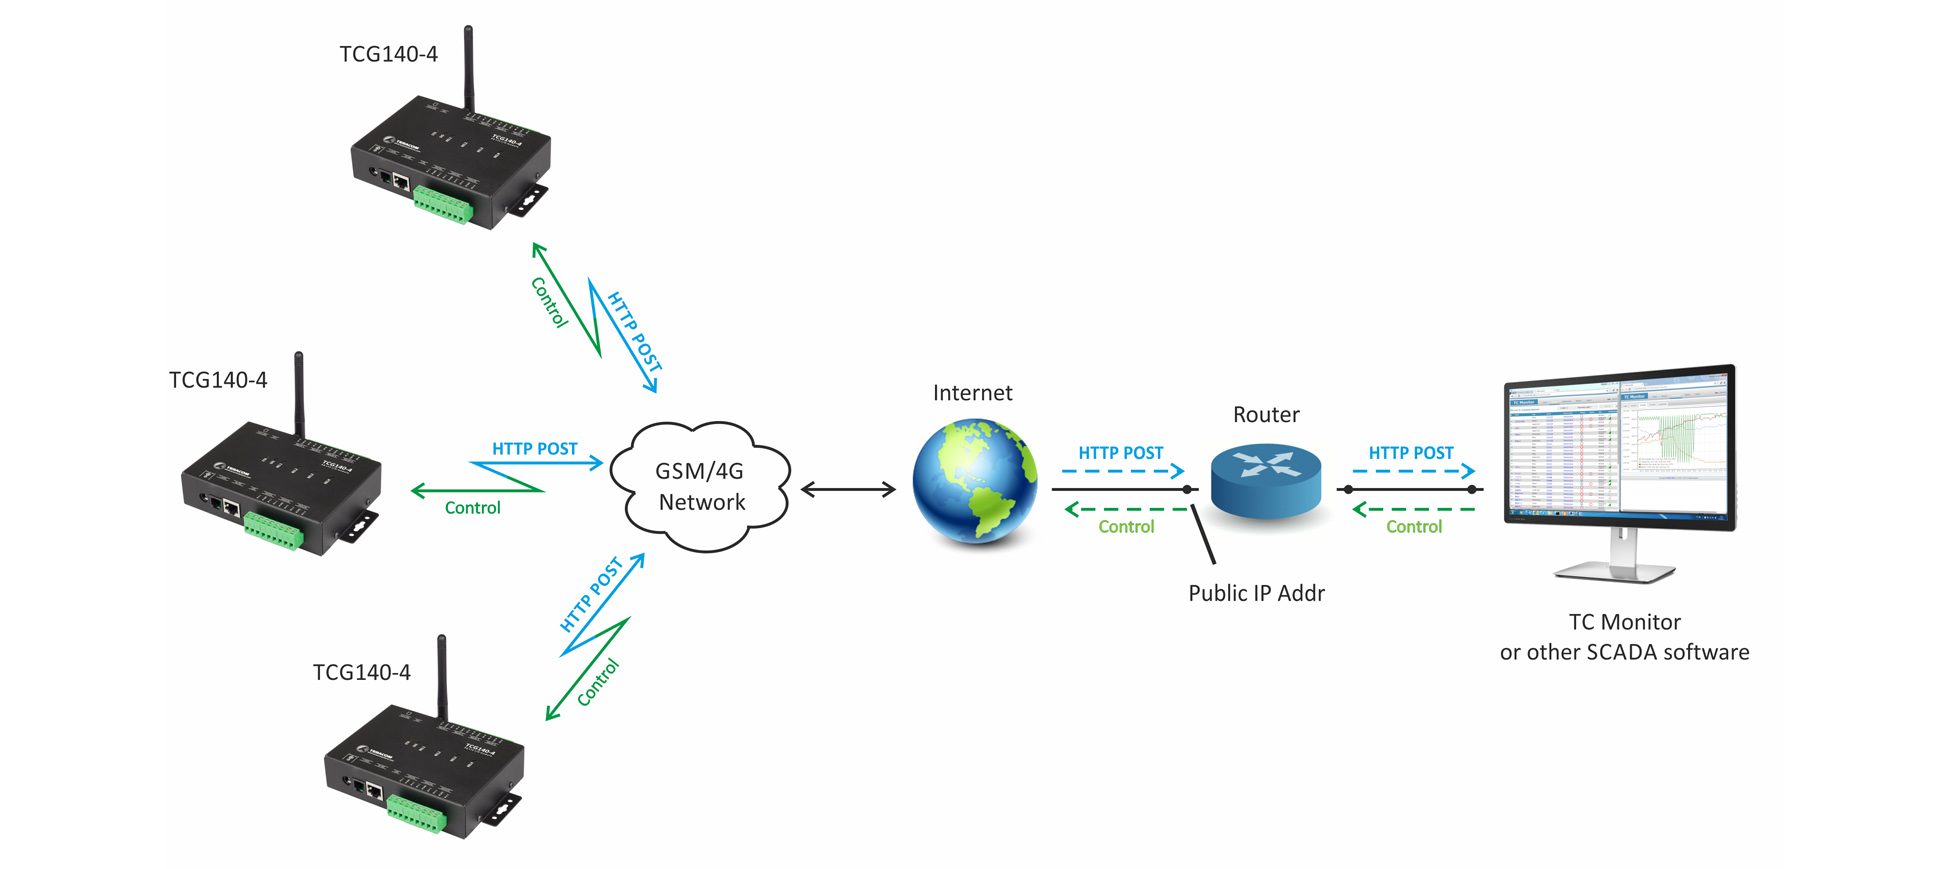 gsm-gprs-remote-io-module-tcg140-4-app2